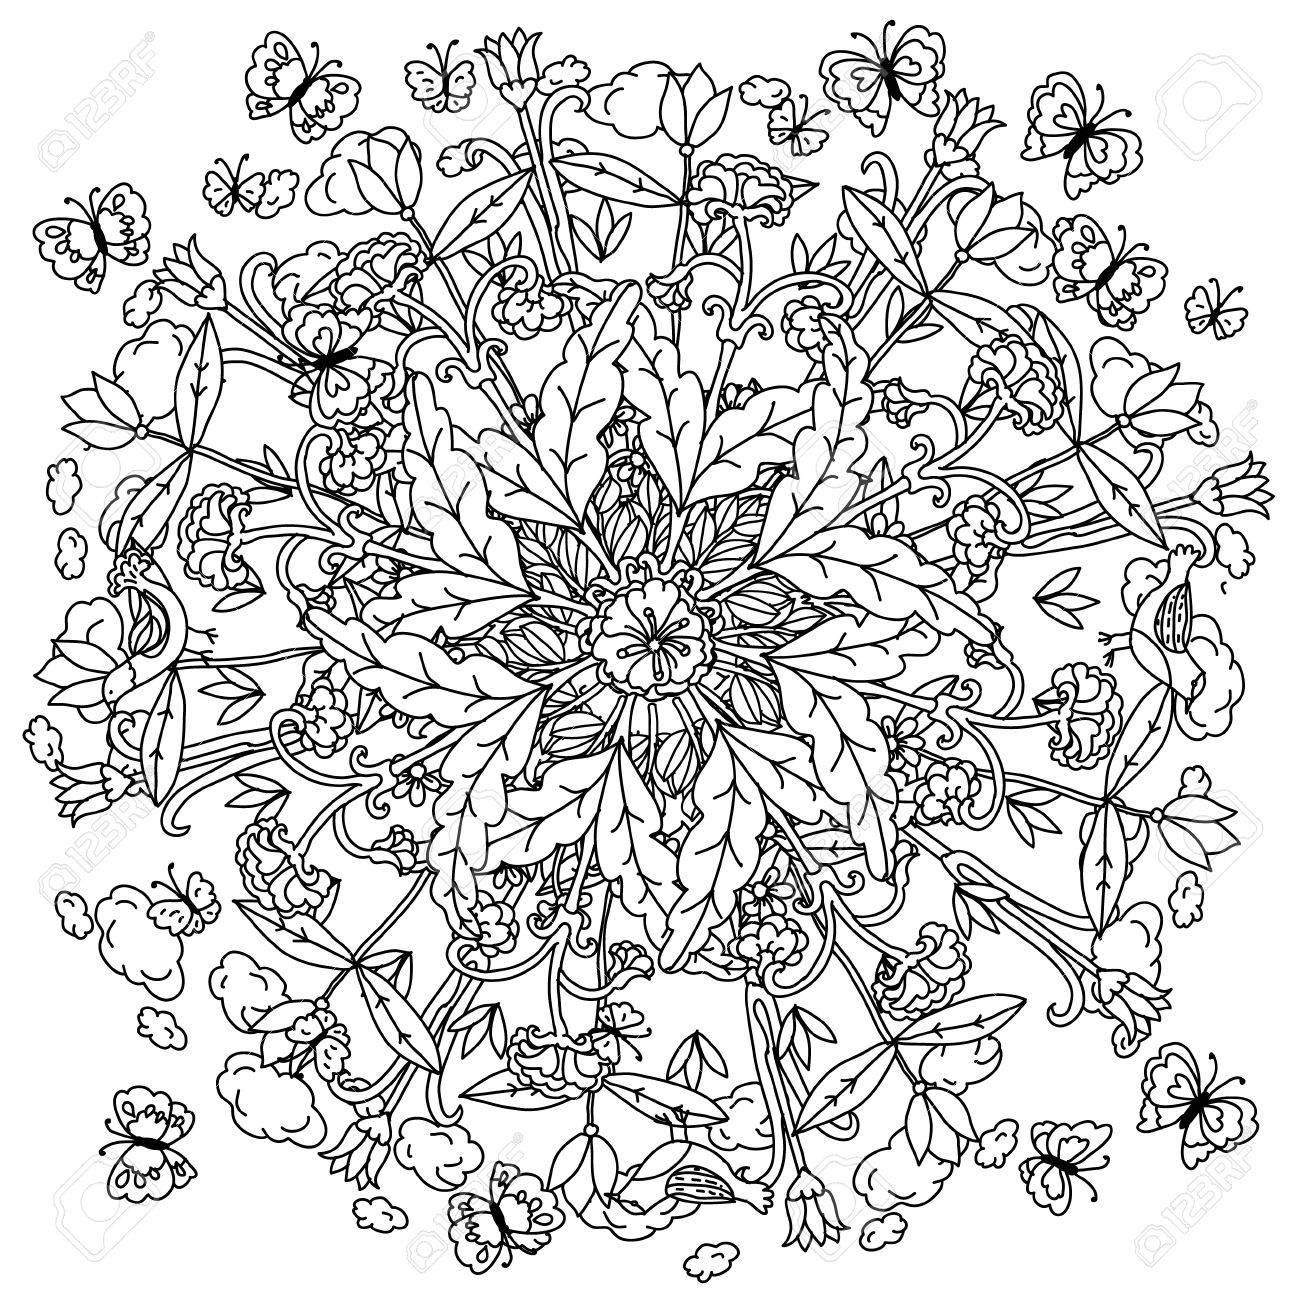 Amazing Flowers And Butterflies Garden Plants Vector Hand Drawn Art Mandala Concept